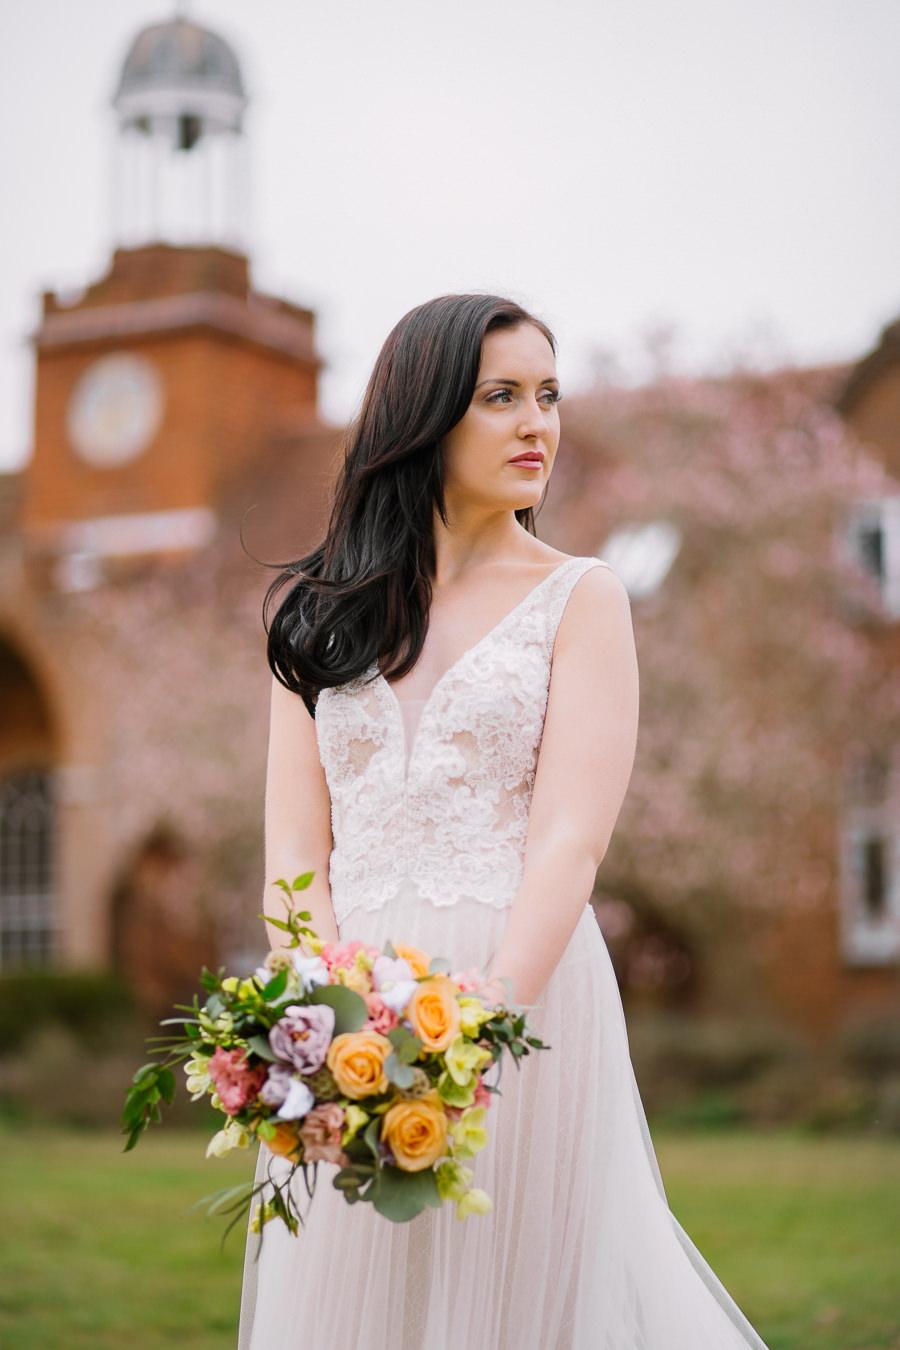 'Understated Elegance' Spring Styled Hampshire Bridal Shoot – Rownhams House, photo credit Nisha Haq Photography (15)